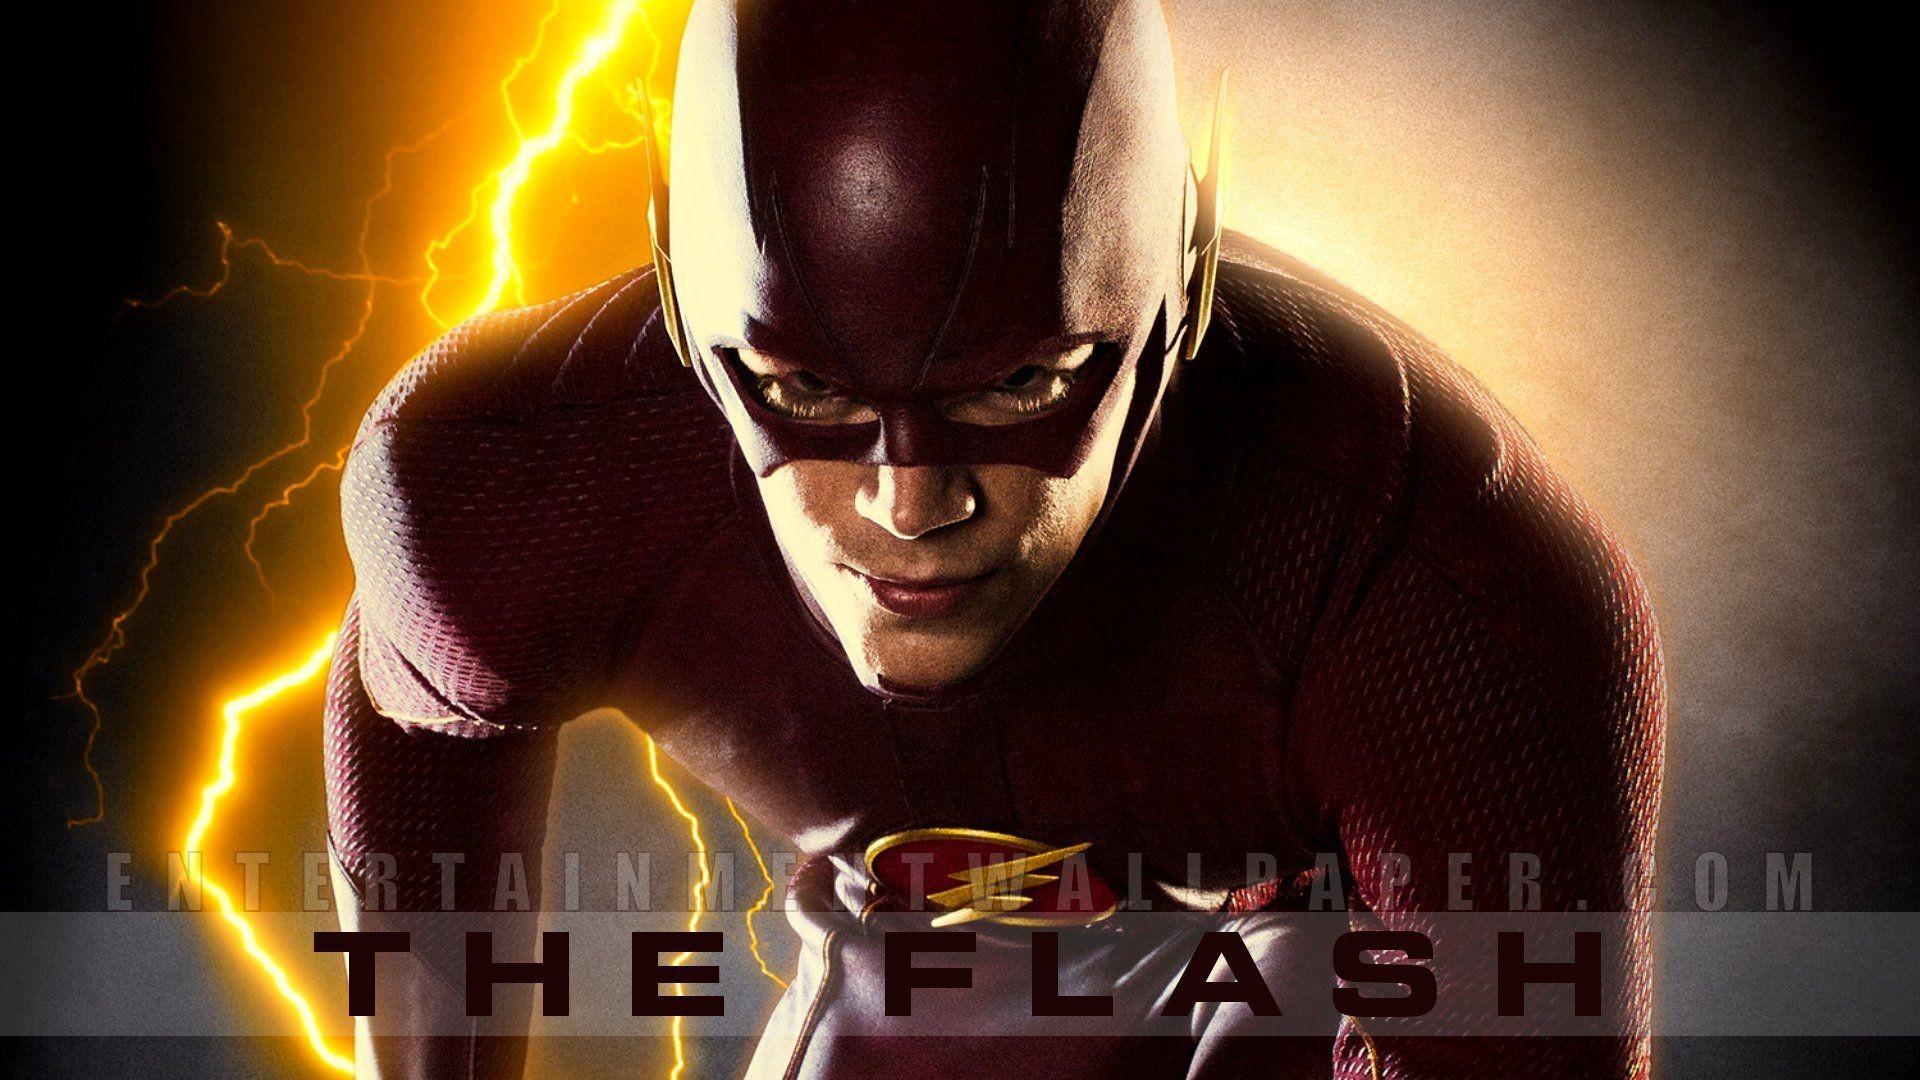 The Flash (2014) Wallpapers – SETUIX.COM